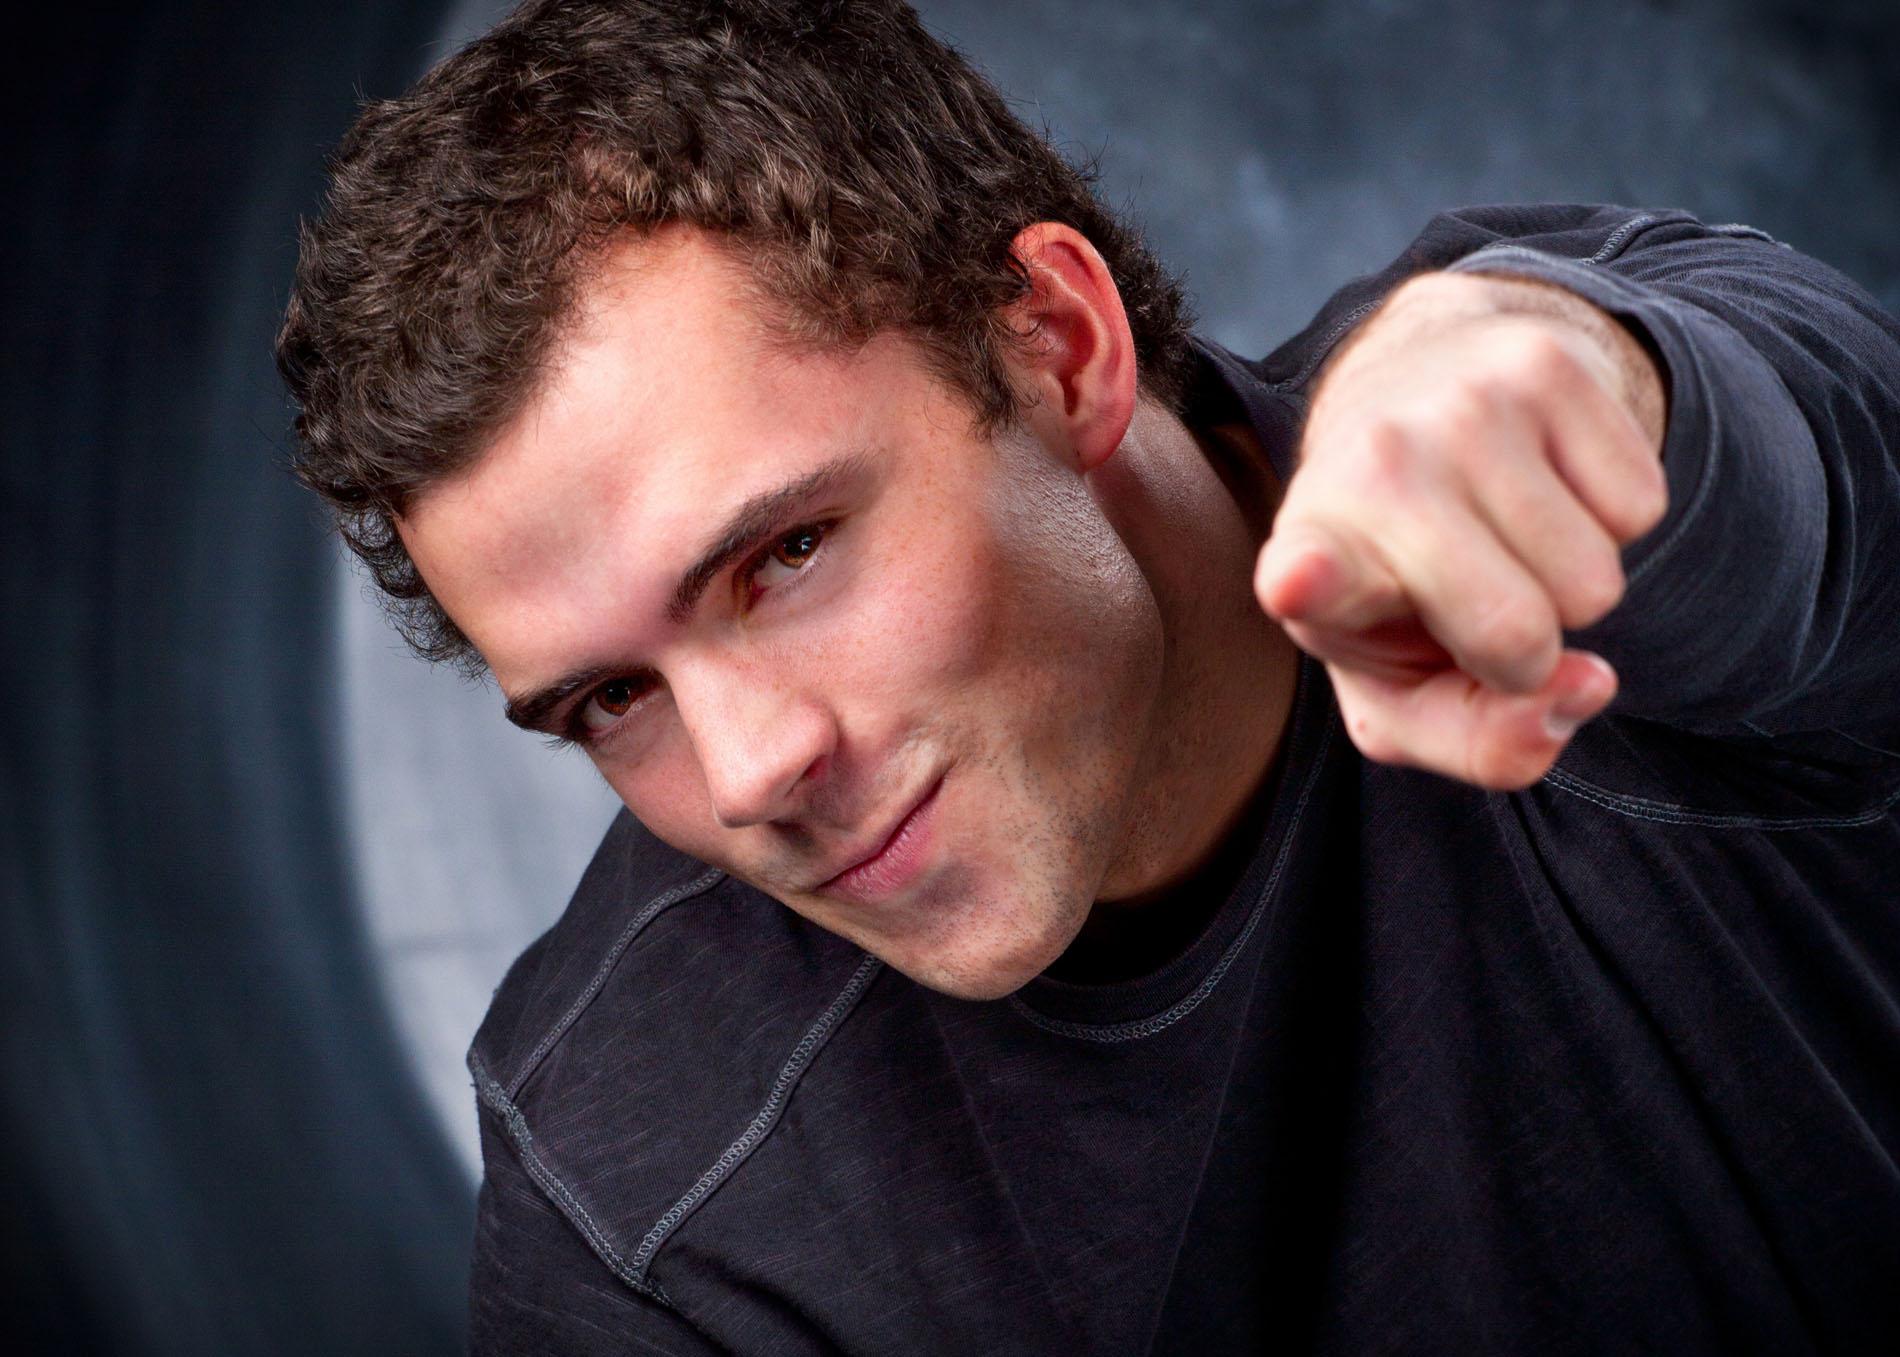 senior guy pointing at lens in studio portrait